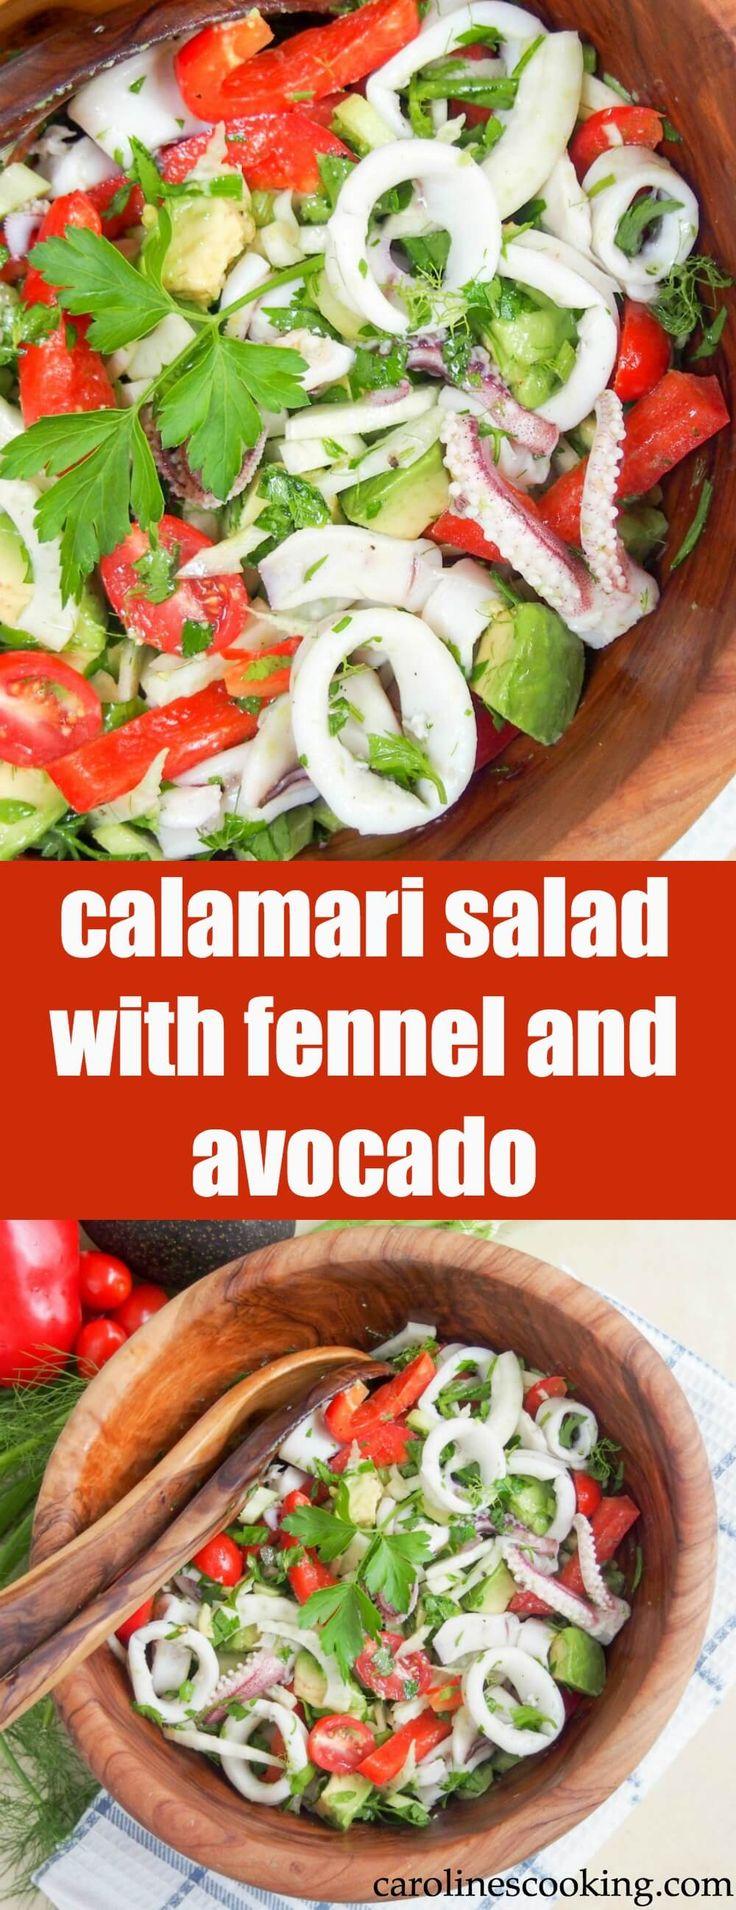 calamari salad with fennel and avocado